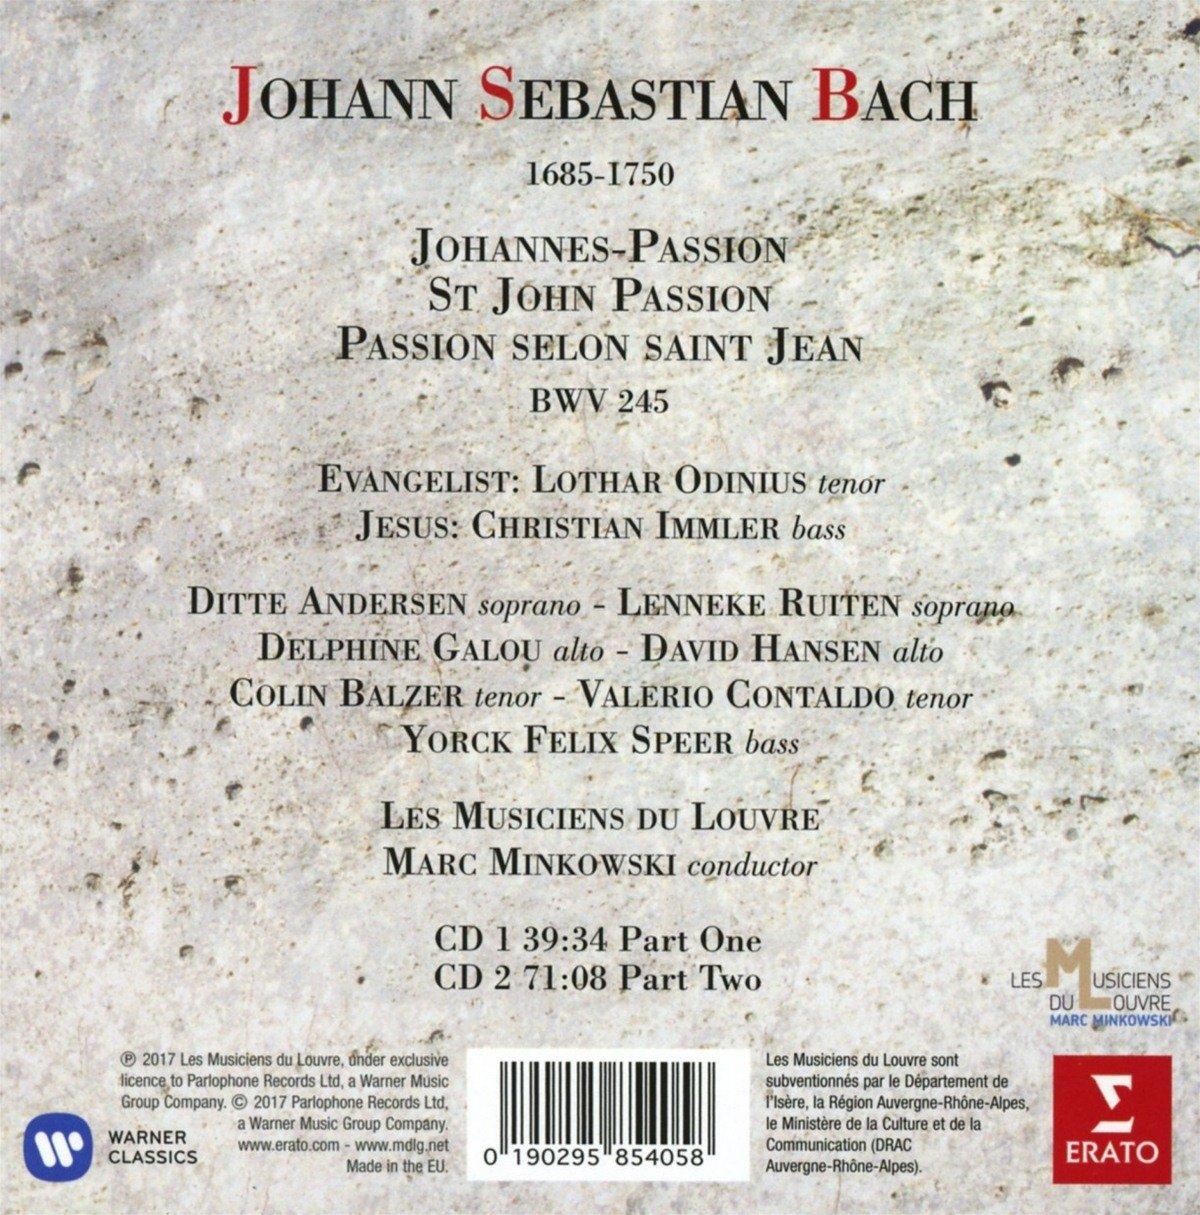 The Netherlands Bach Society